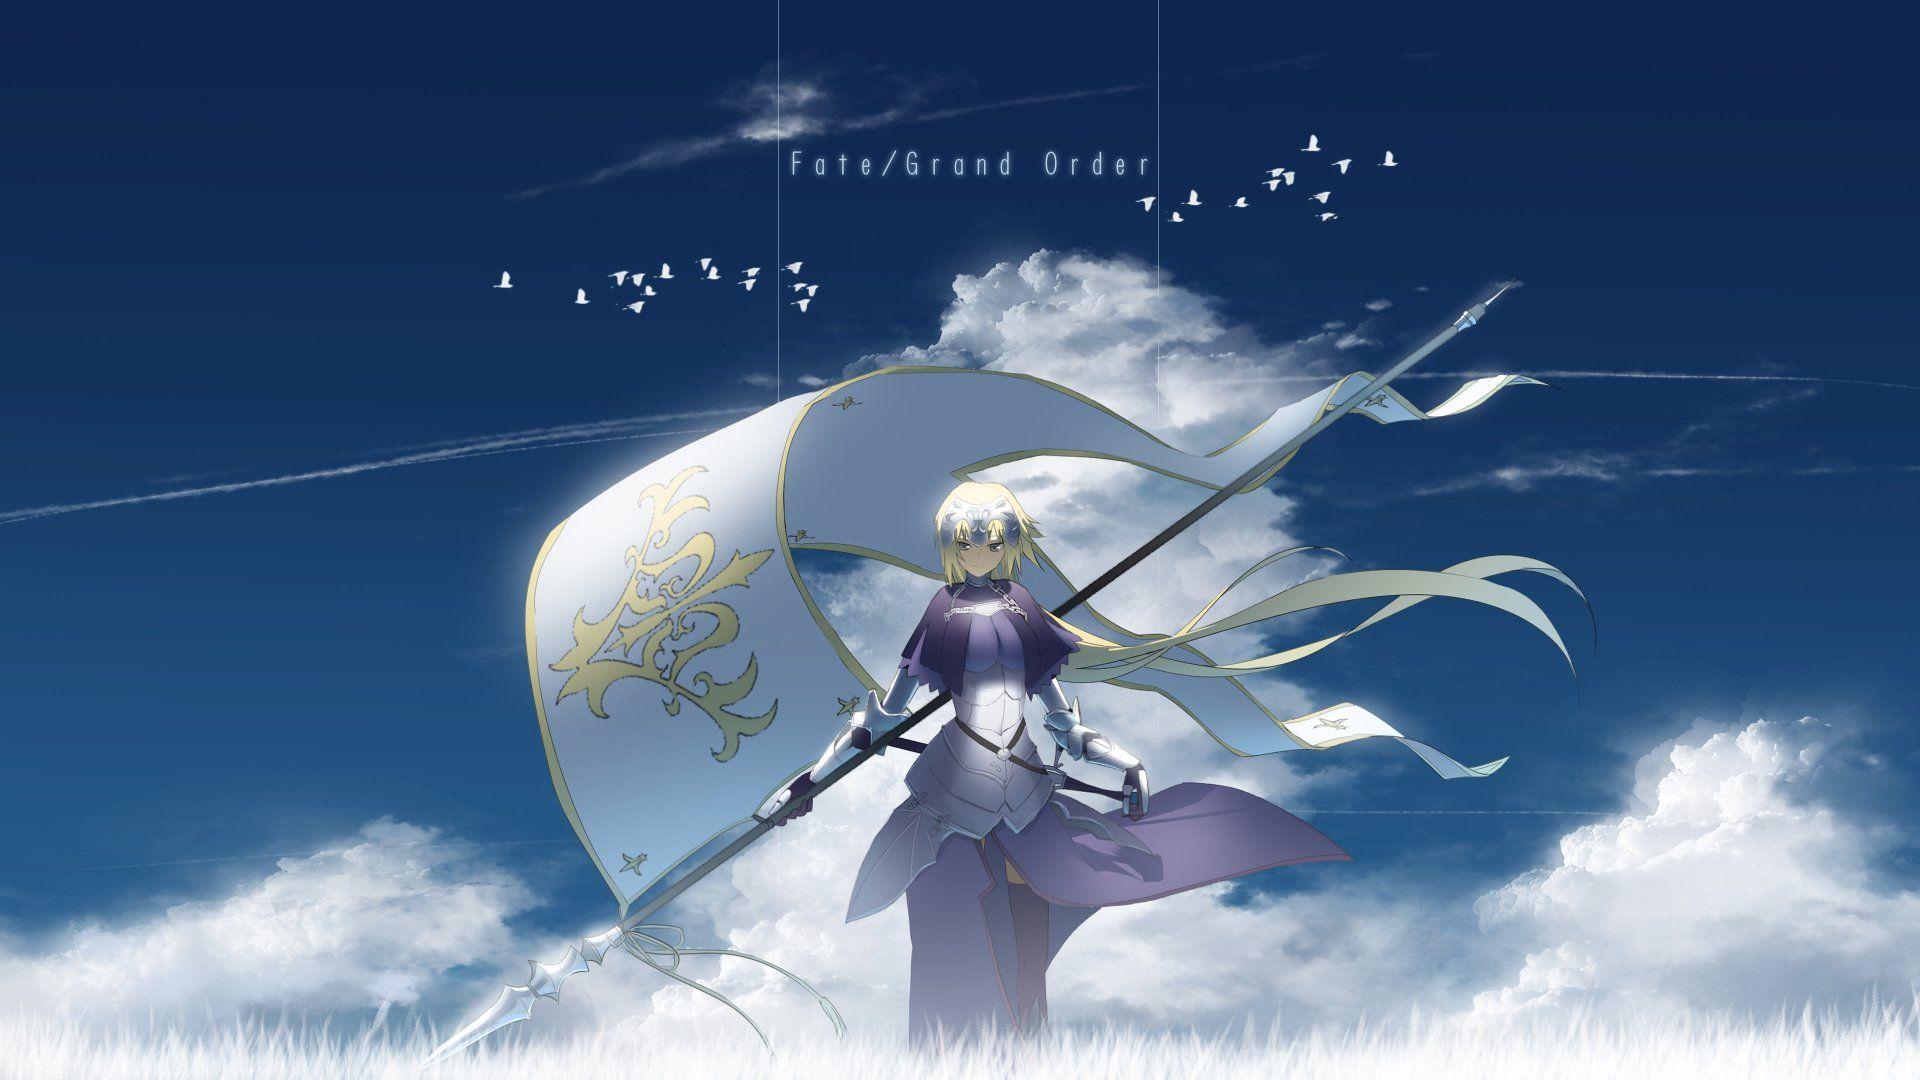 Anime Fate Grand Order Ruler Fate Apocrypha Ruler Fate Grand